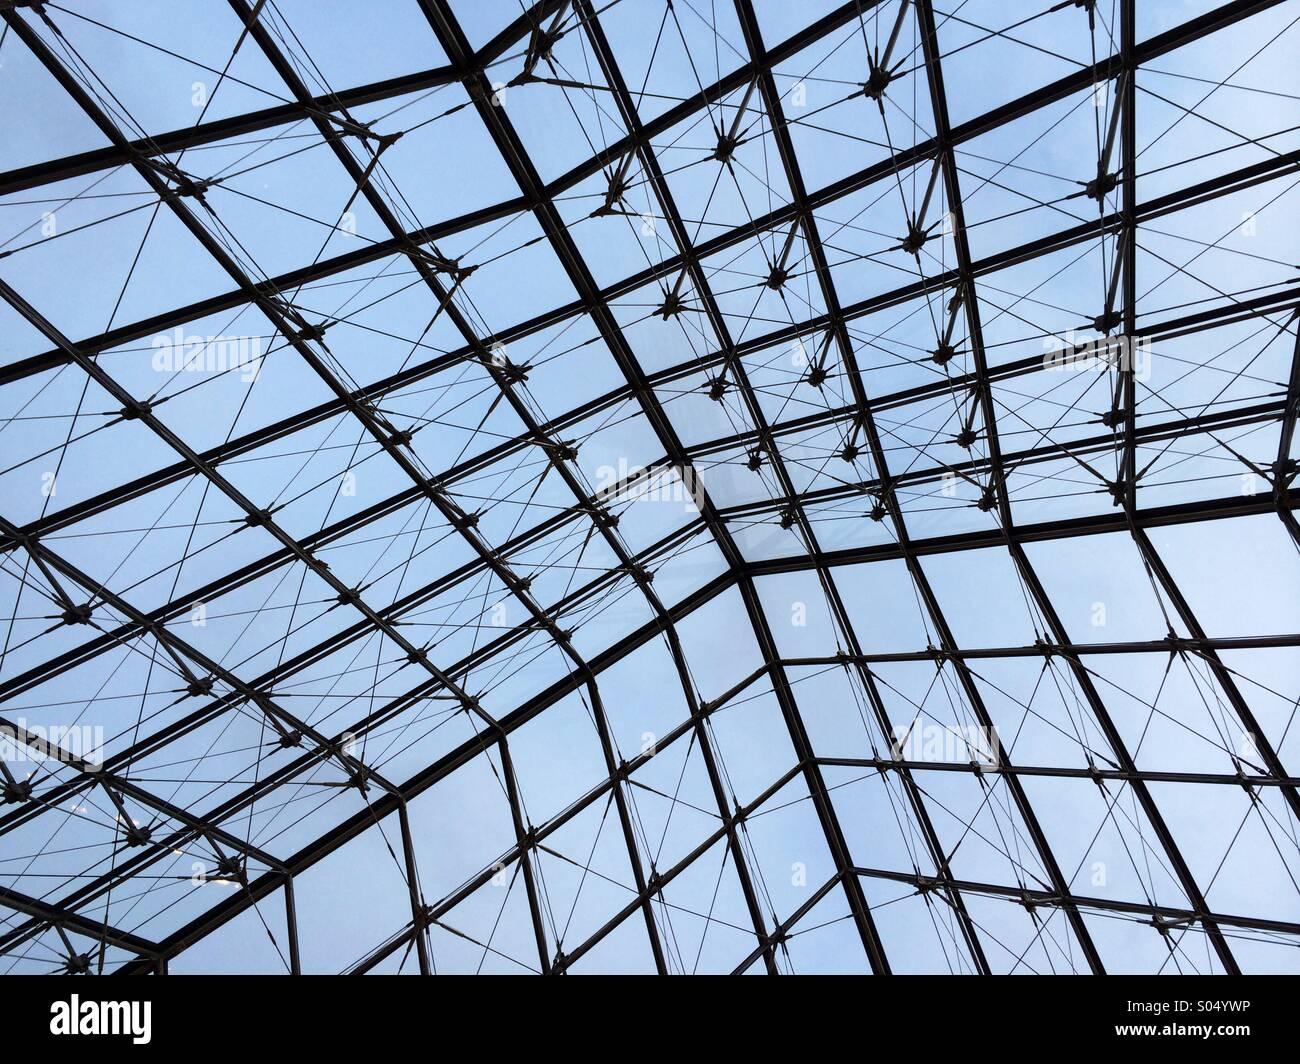 Geometric - Stock Image